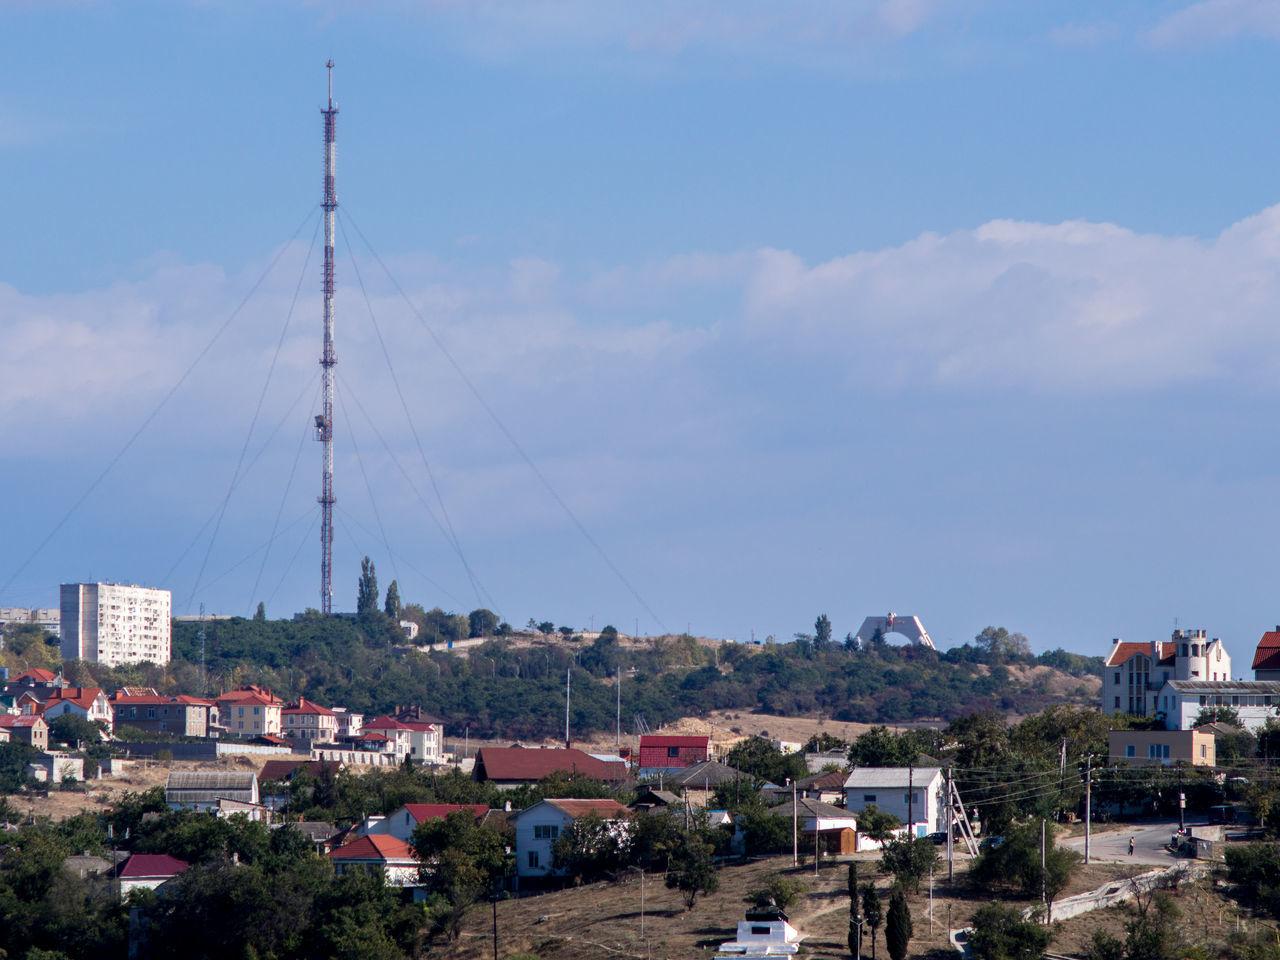 Amusement Park Built Structure City City Landscape City View  Cloud - Sky Crimea Day Gawlet Landscape No People Outdoors Russia Sevastopol  Sky Television Tower Tree